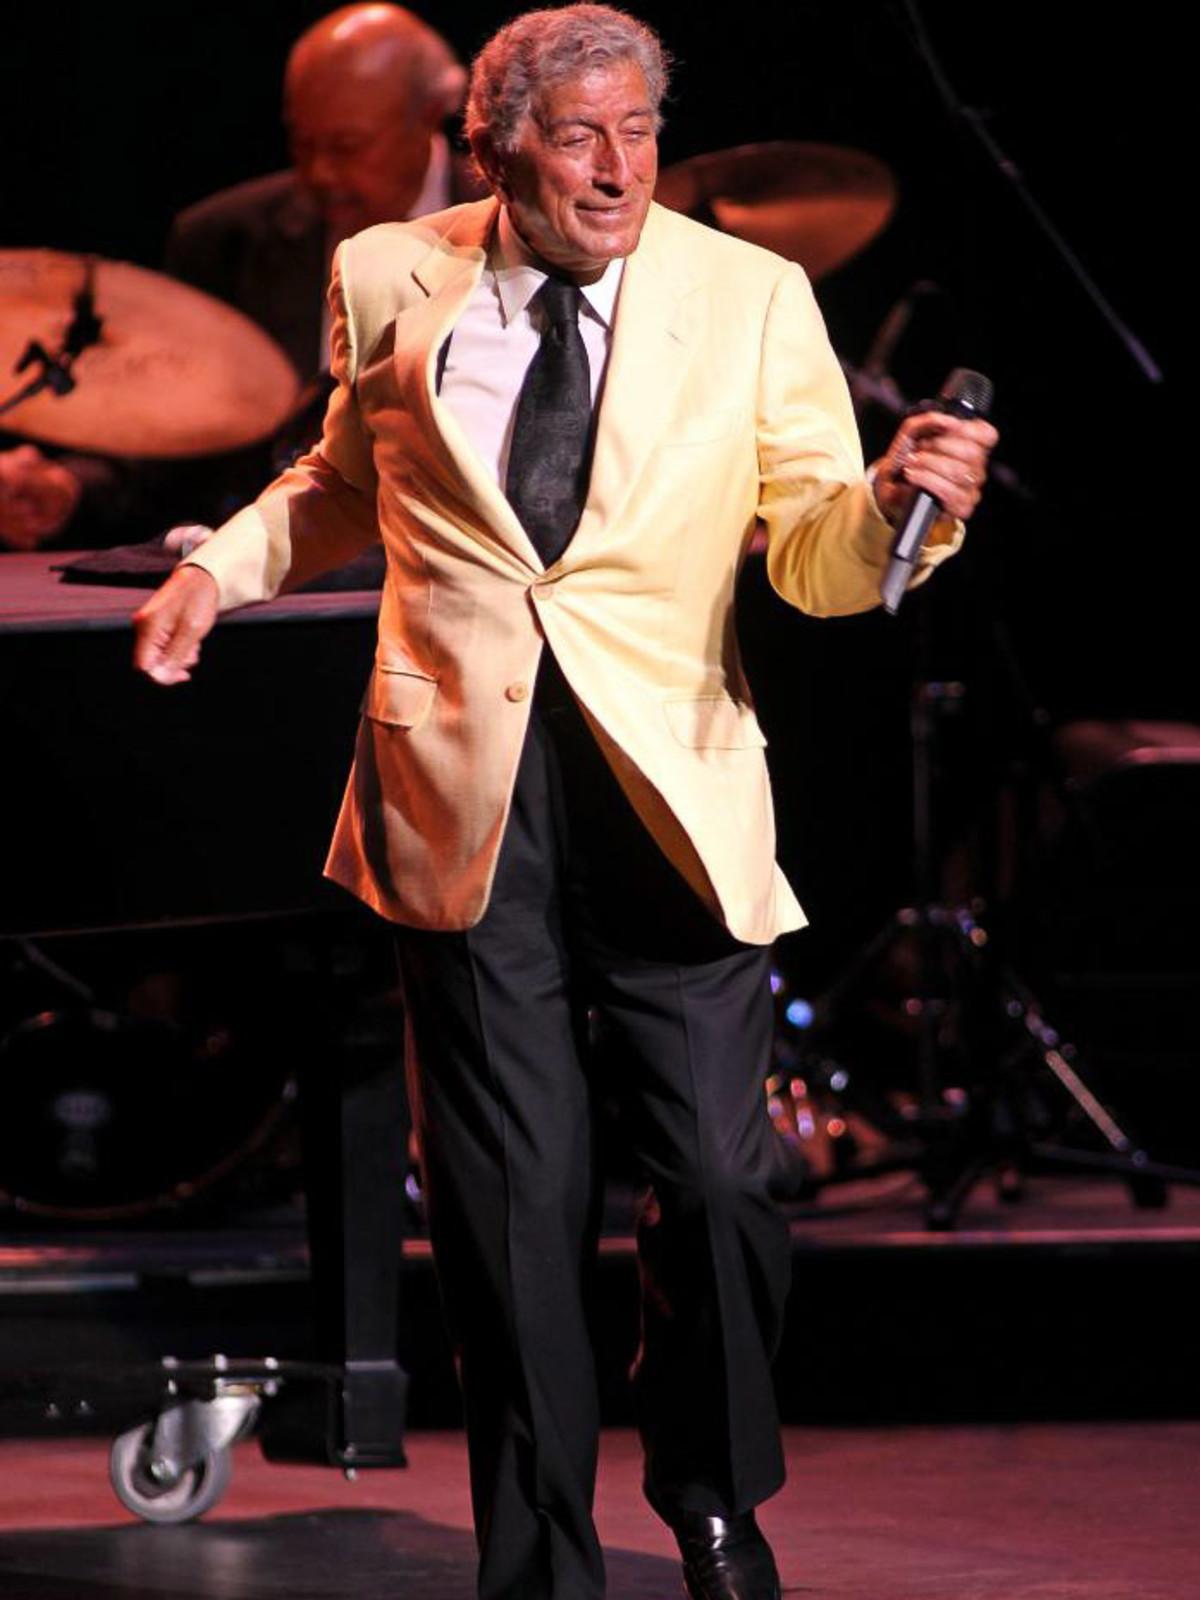 News_Michael_concert pick_Tony Bennett